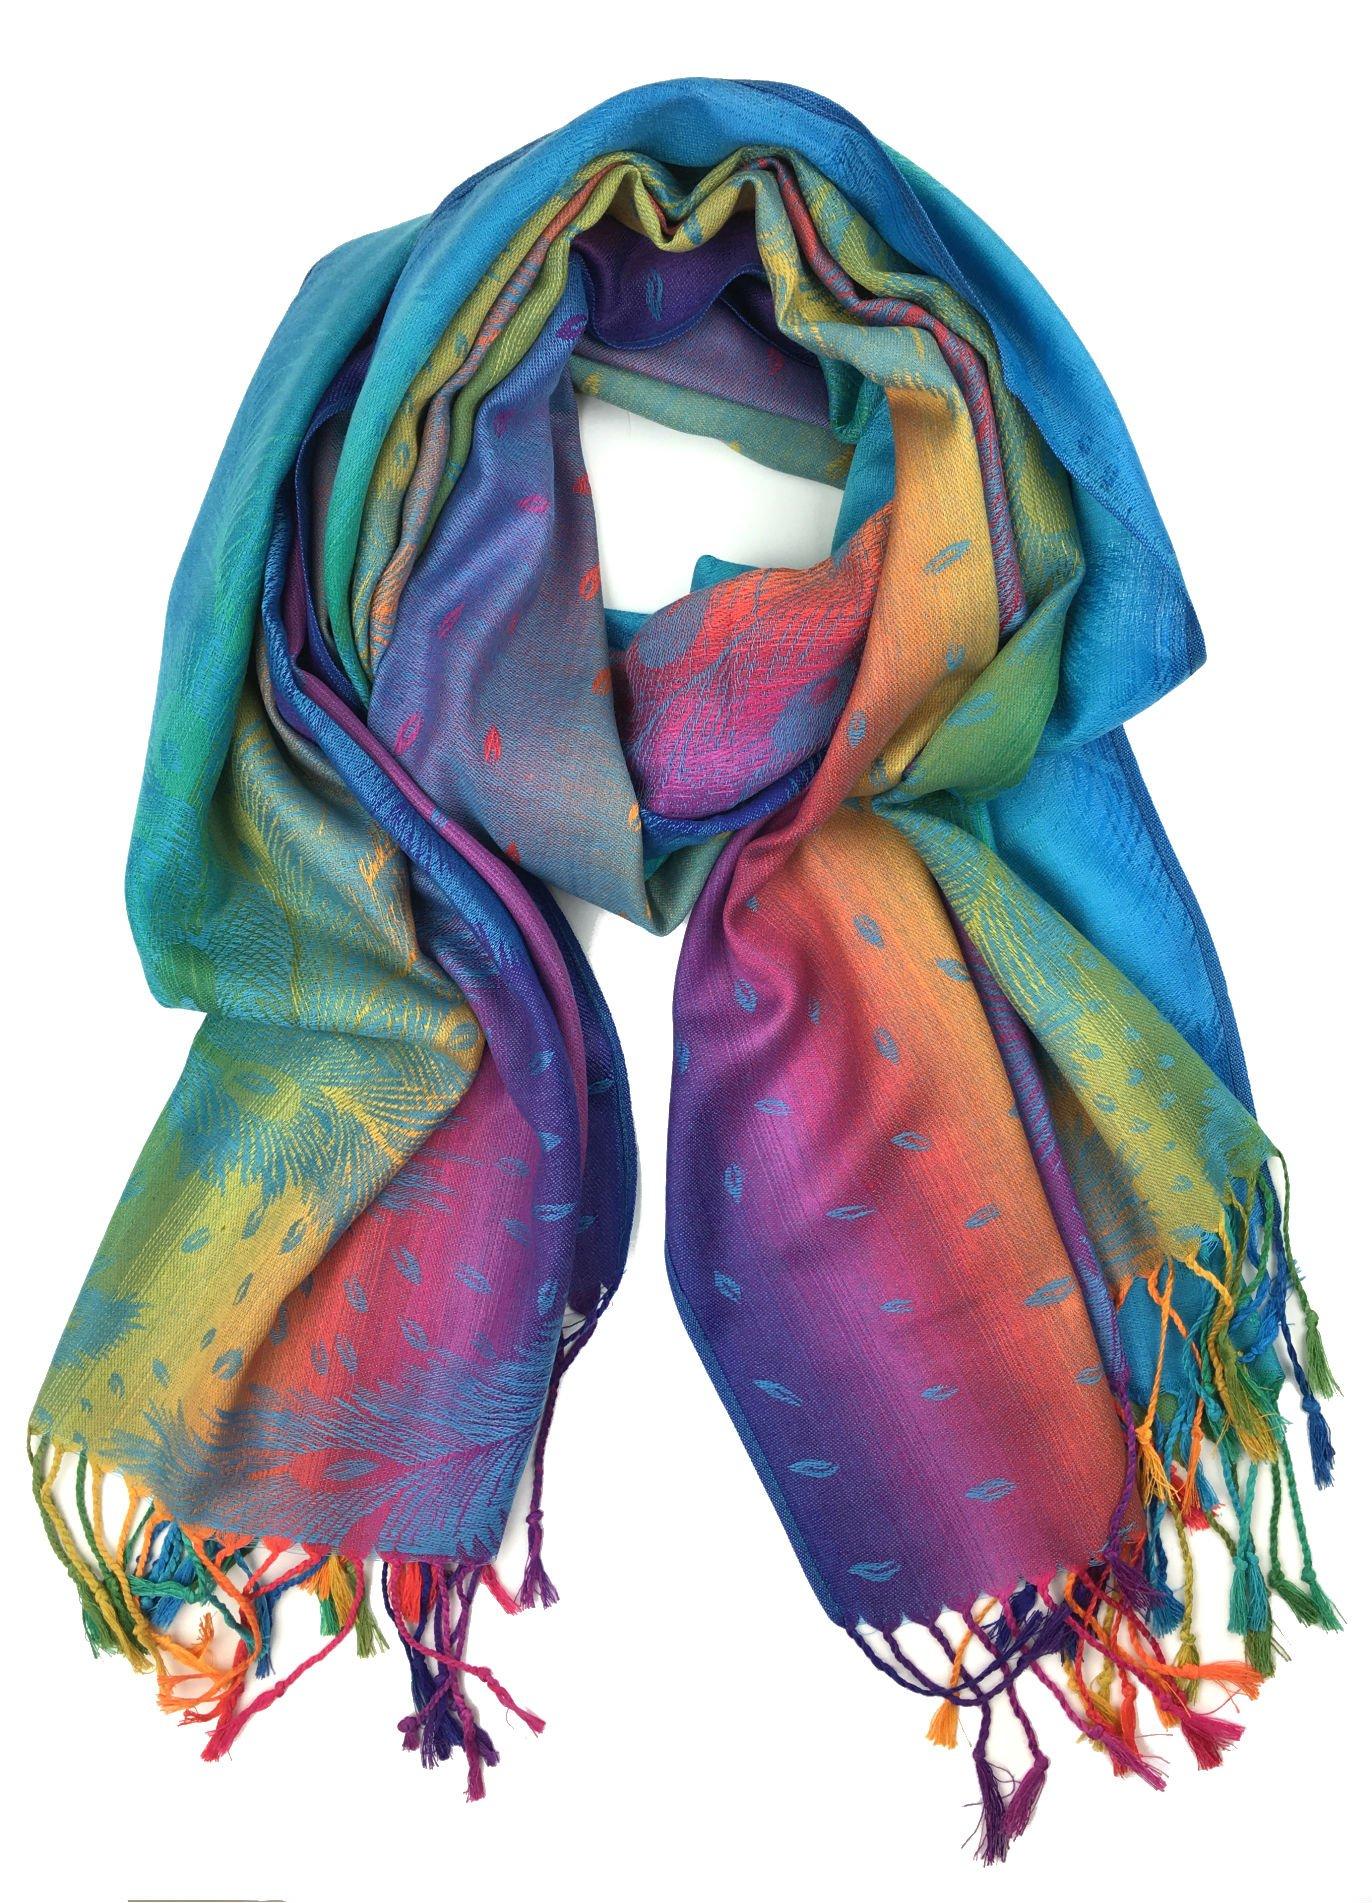 Plum Feathers Tapestry Ethnic Paisley Pattern Pashmina Scarf blue rainbow